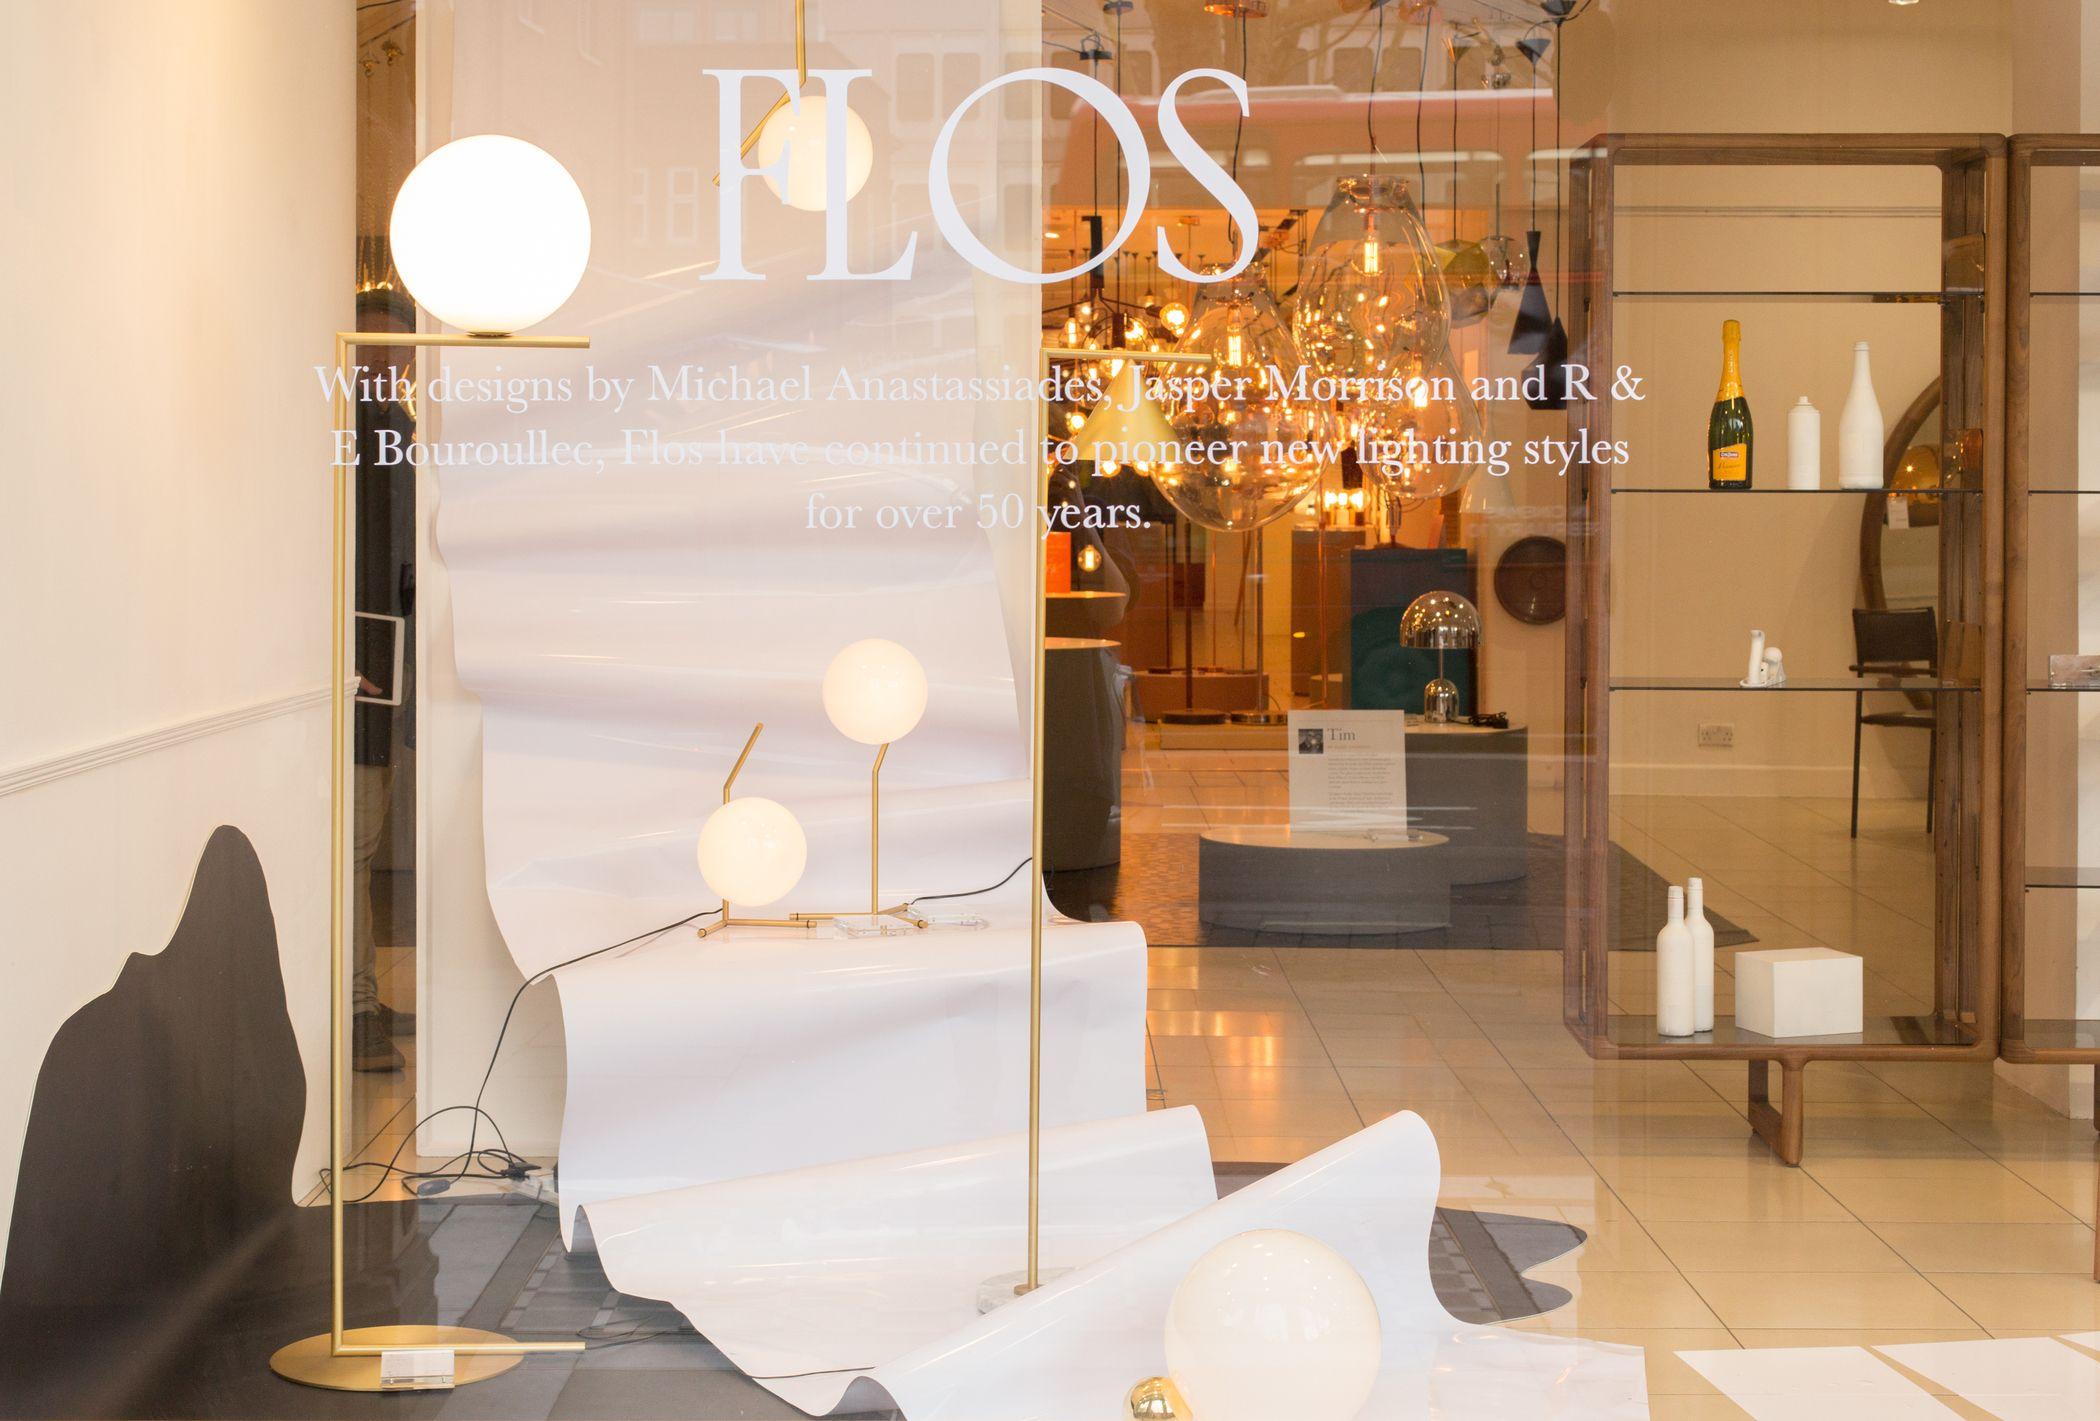 Flos Window Display At Heal S Tottenham Court Road To Celebrate Edizione Italiane Contemporary Furniture Design Space Interiors Interior Trend